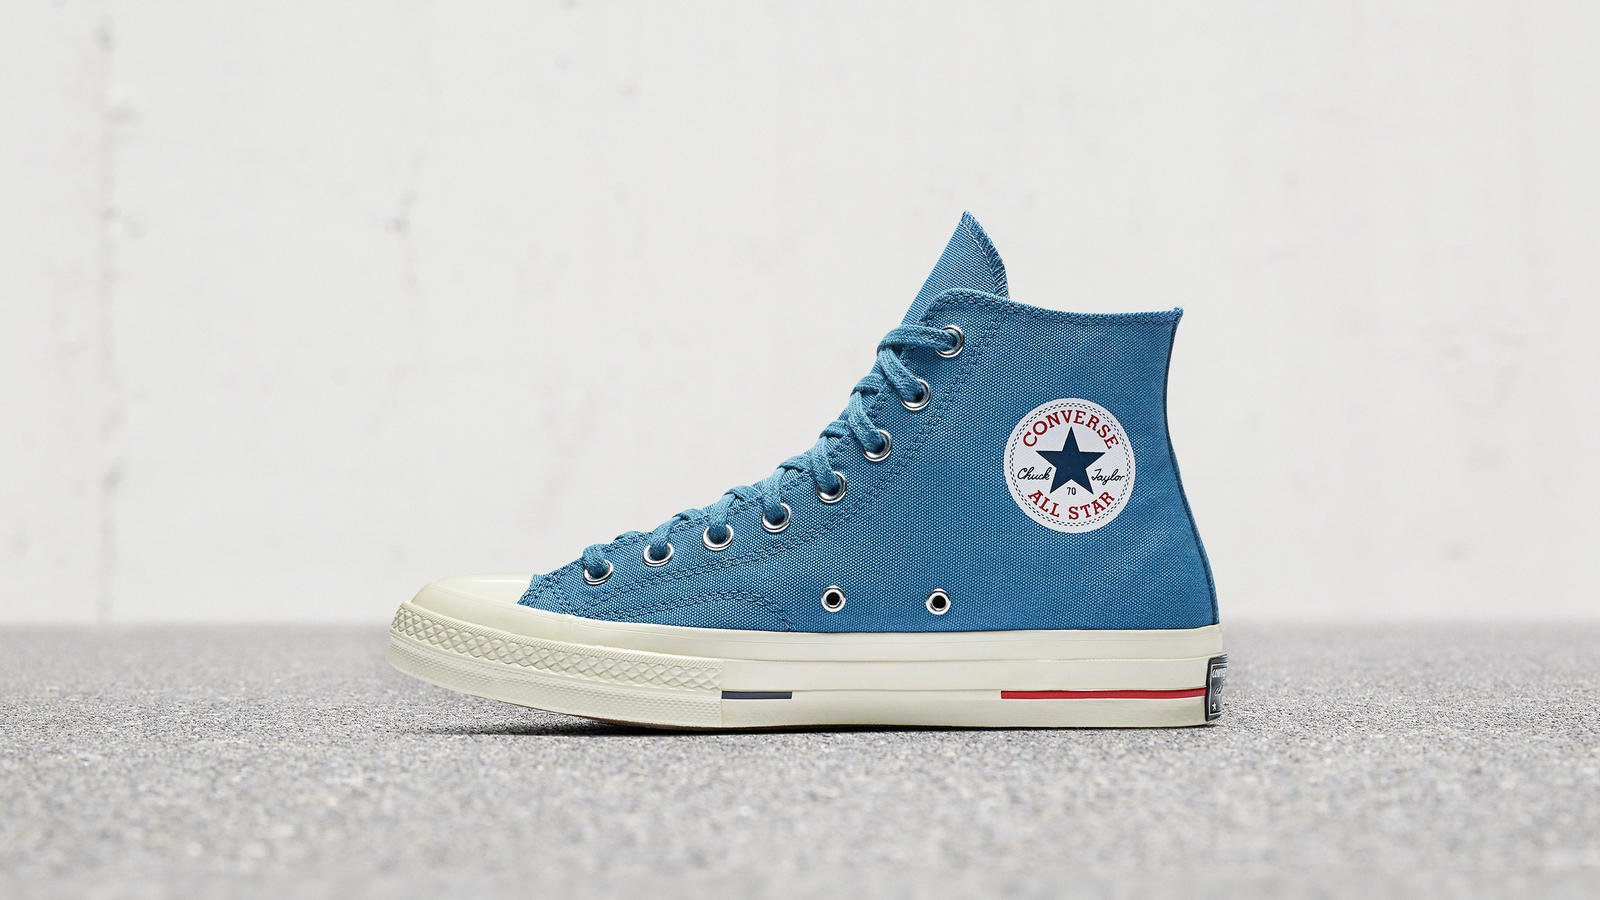 Sepatu Converse Chuck 70 Heritage Collection - Sneaker Converse Terbaru 2018 Classic Klasik